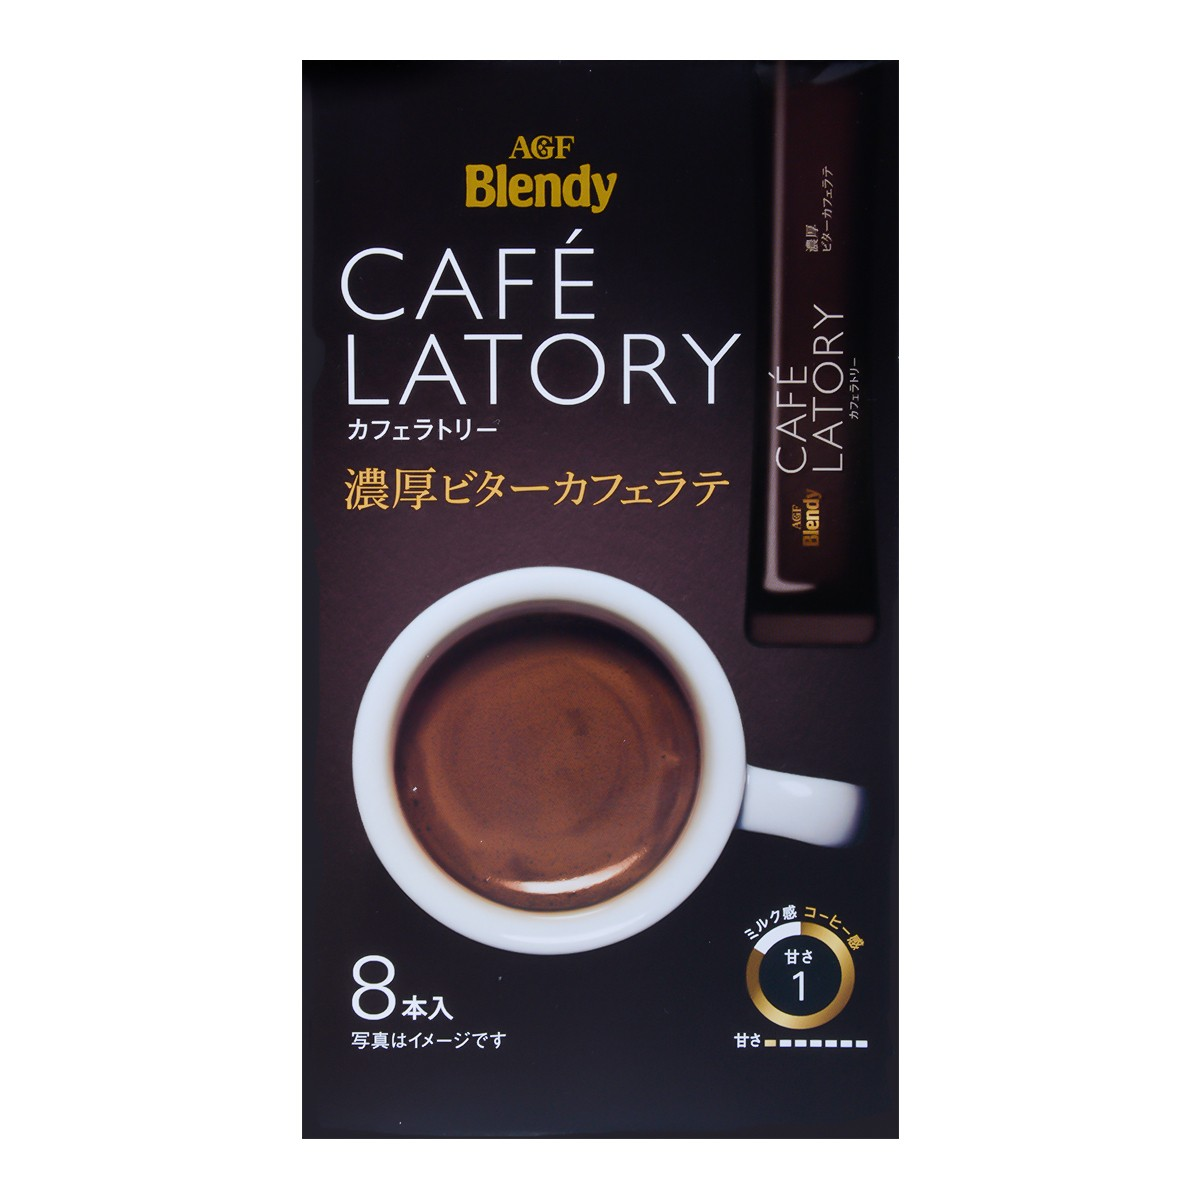 AGF Blendy CAFE LATORY Bitter Cafe Latte 64g